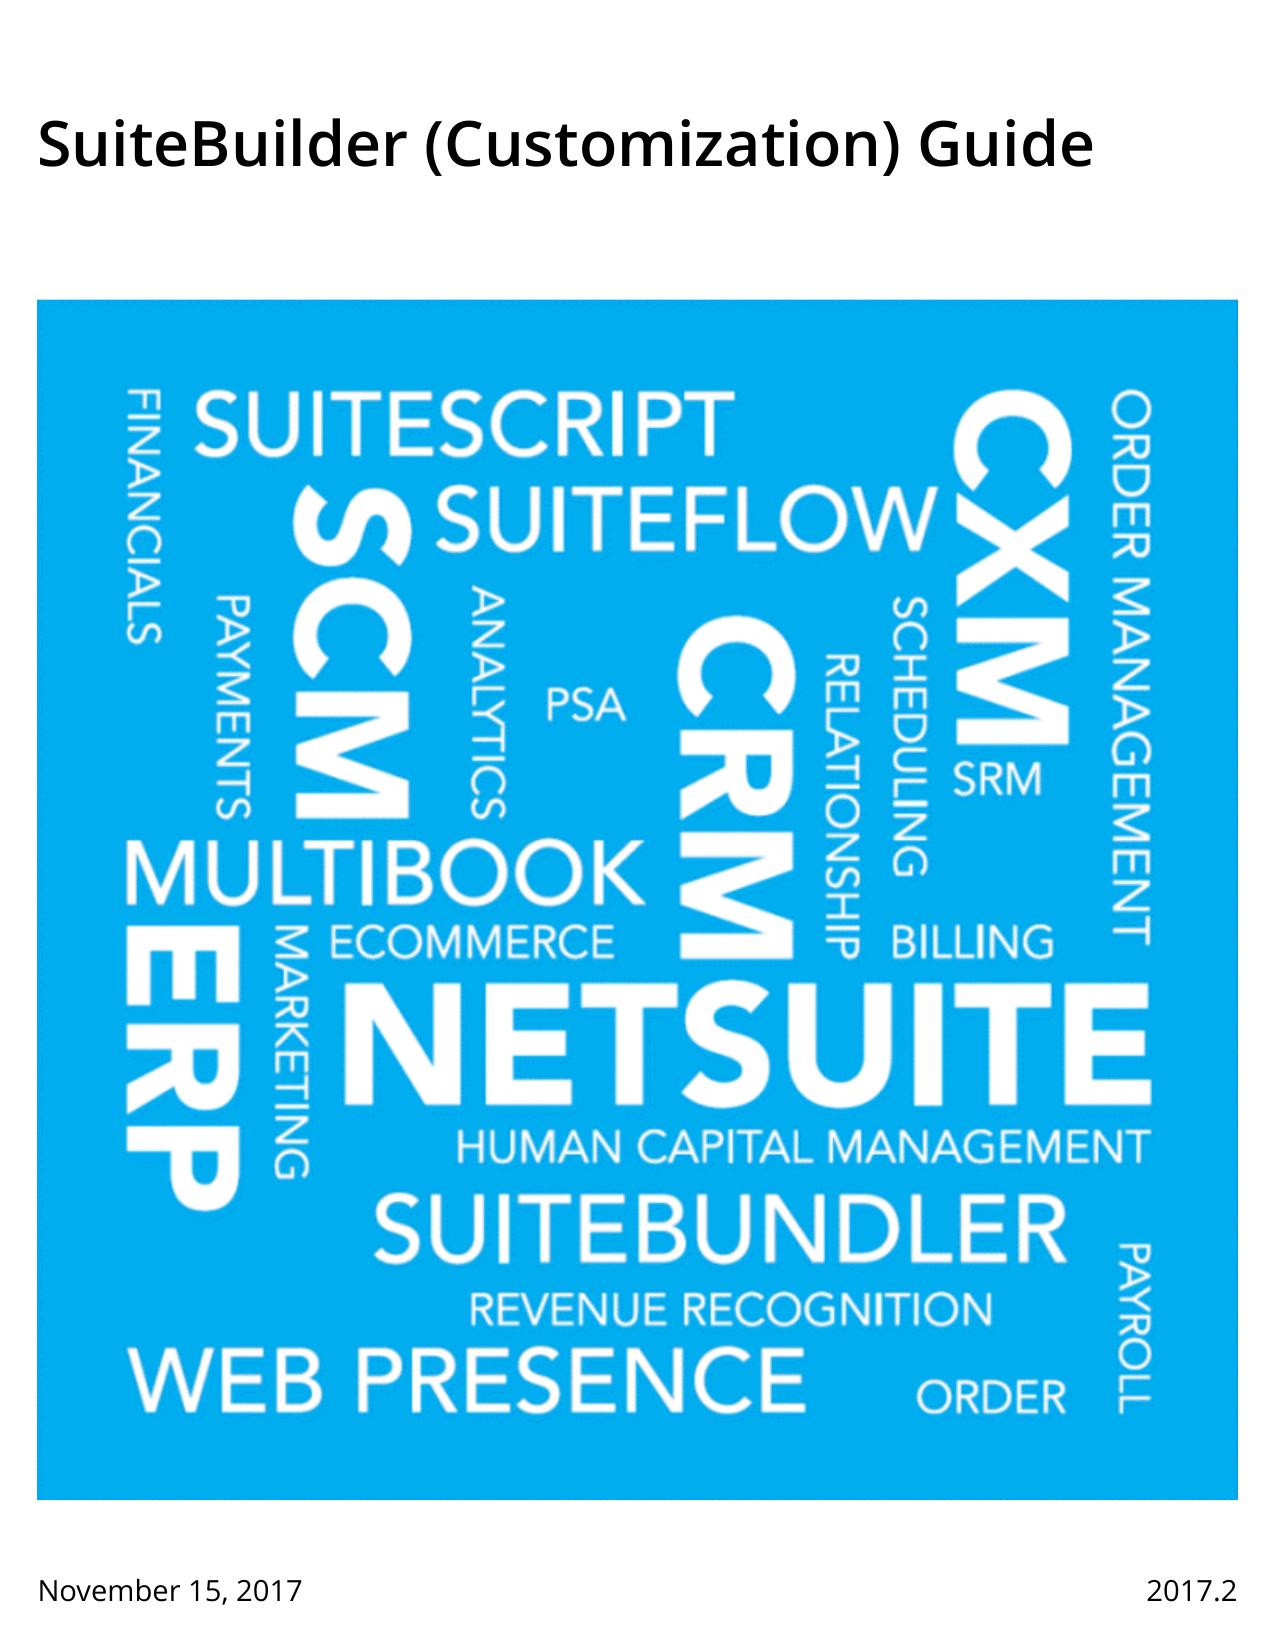 SuiteBuilder (Customization) Guide | manualzz com